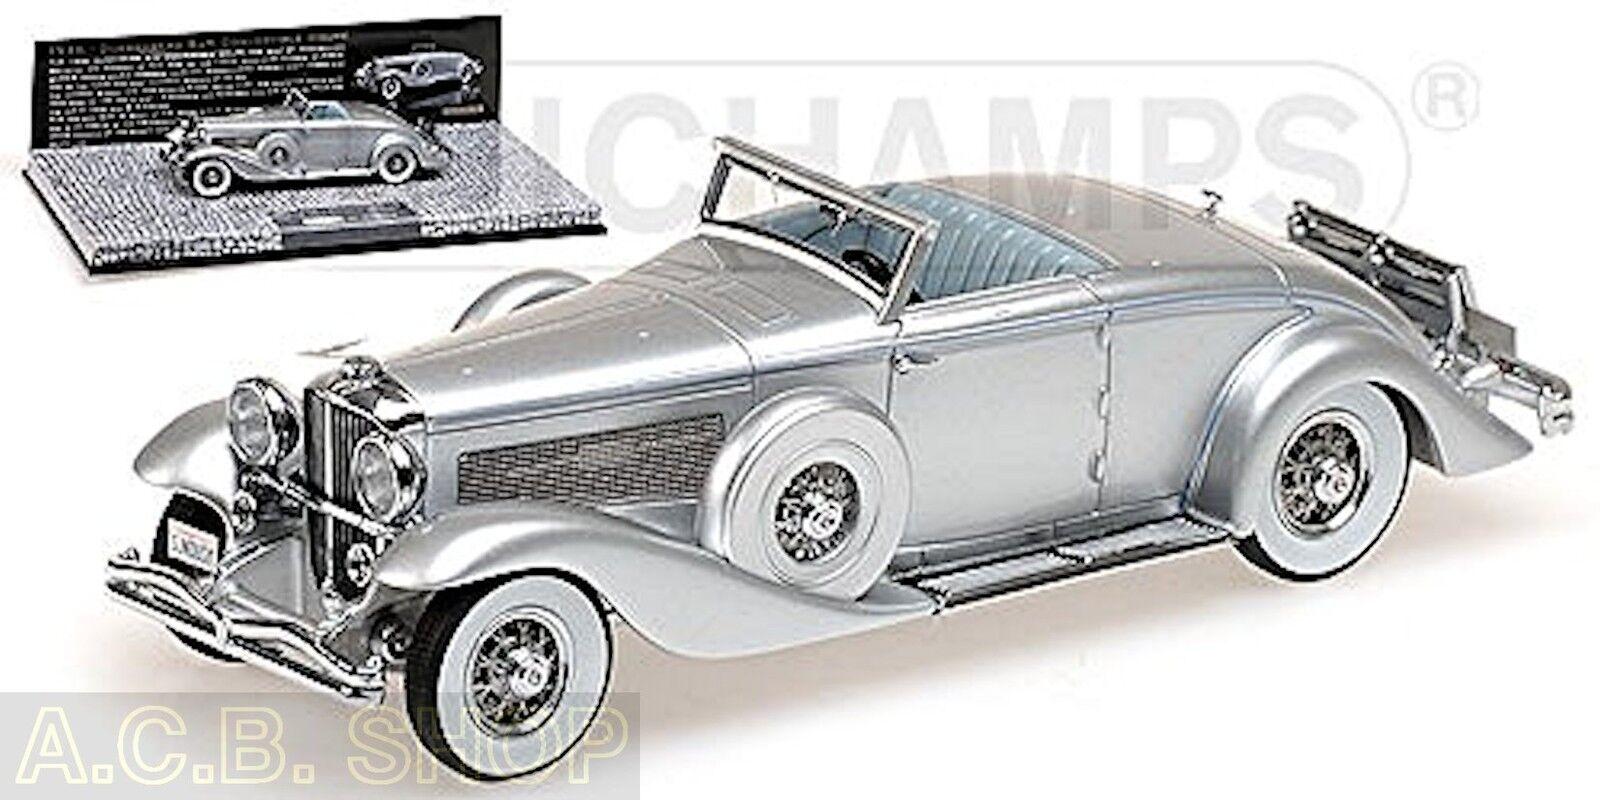 Duesenberg Sjn Congreenible Coupé 1936 1 43 Minichamps First Class Colección